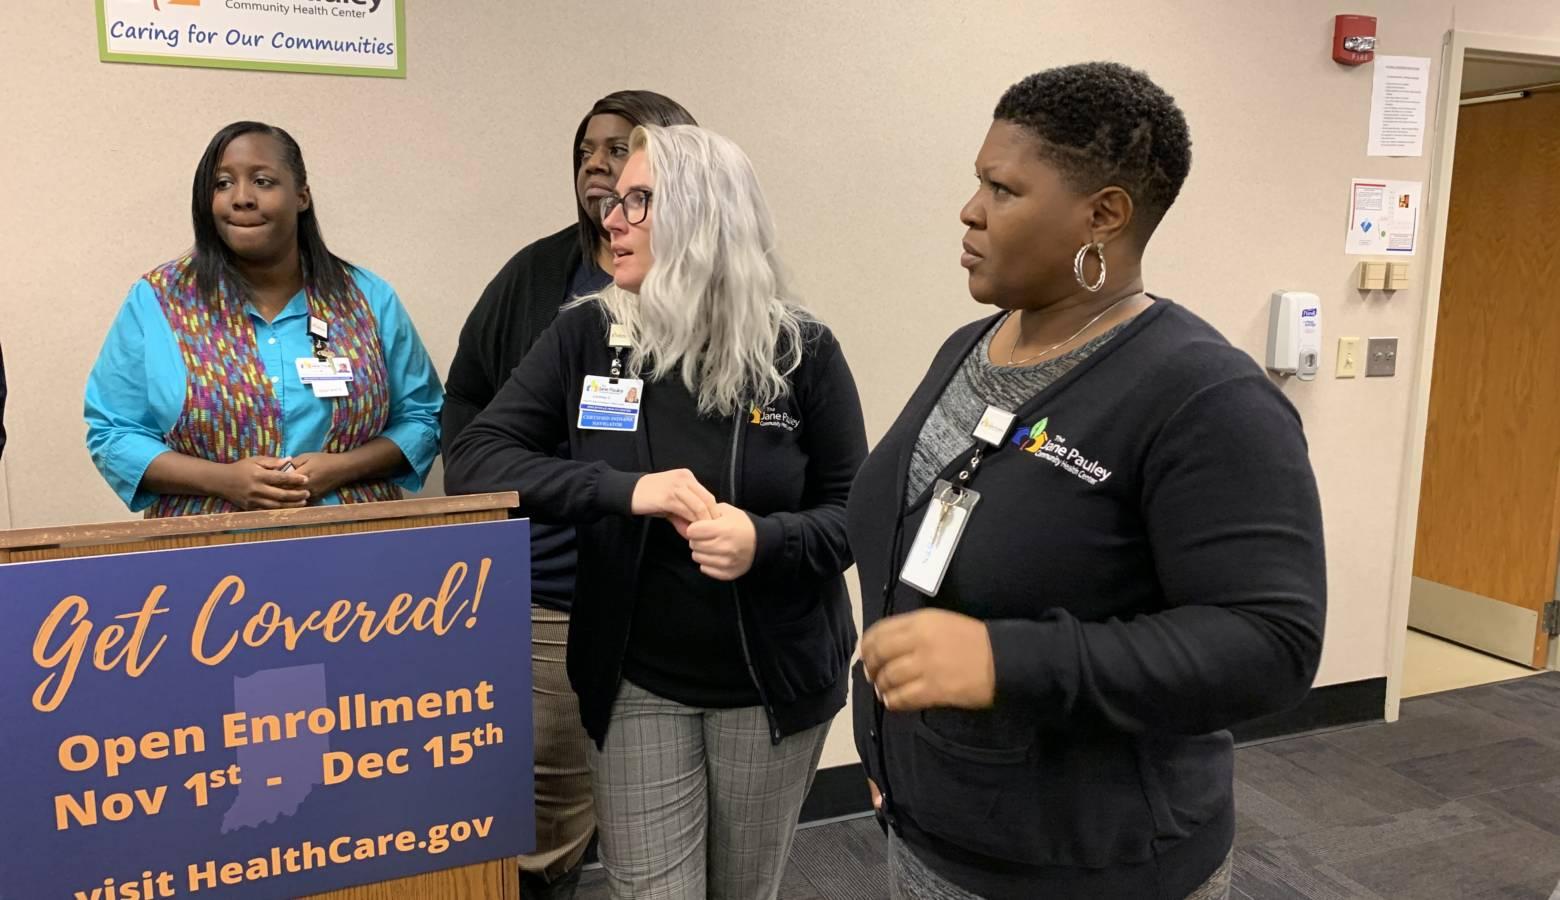 Employees from the Jane Pauley Community Health Center at an open enrollment visit. (Jill Sheridan/IPB News)